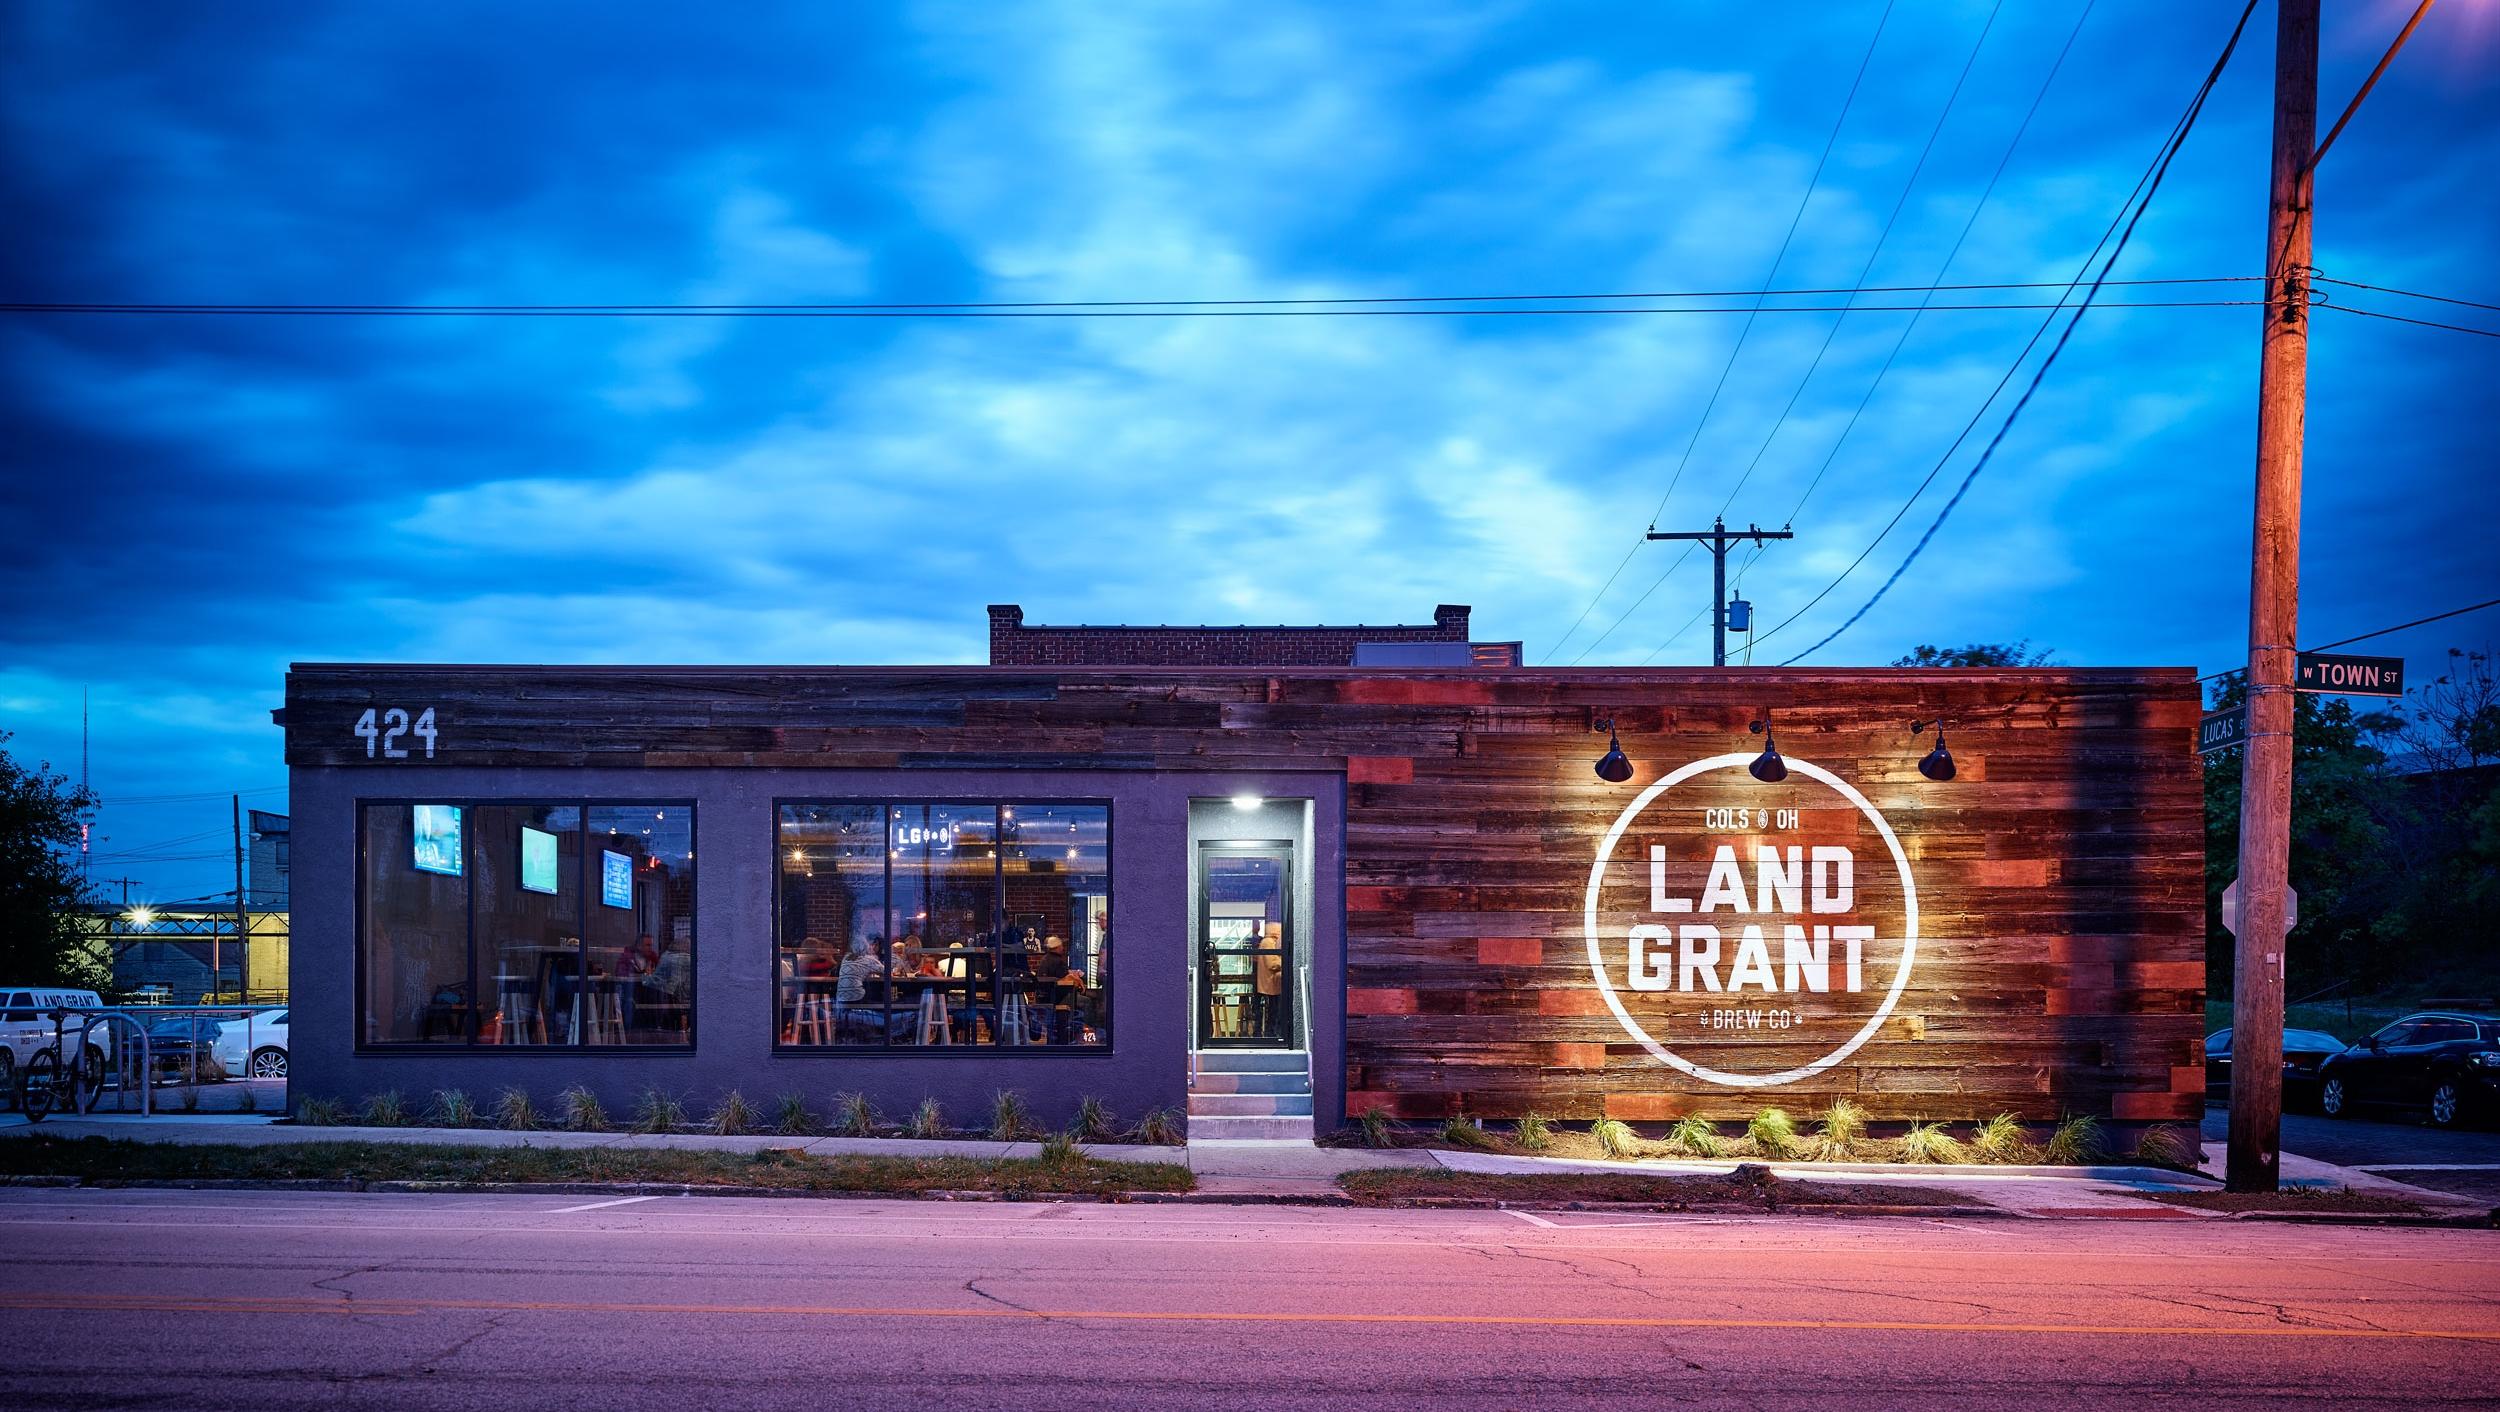 LandGrant-8.jpg